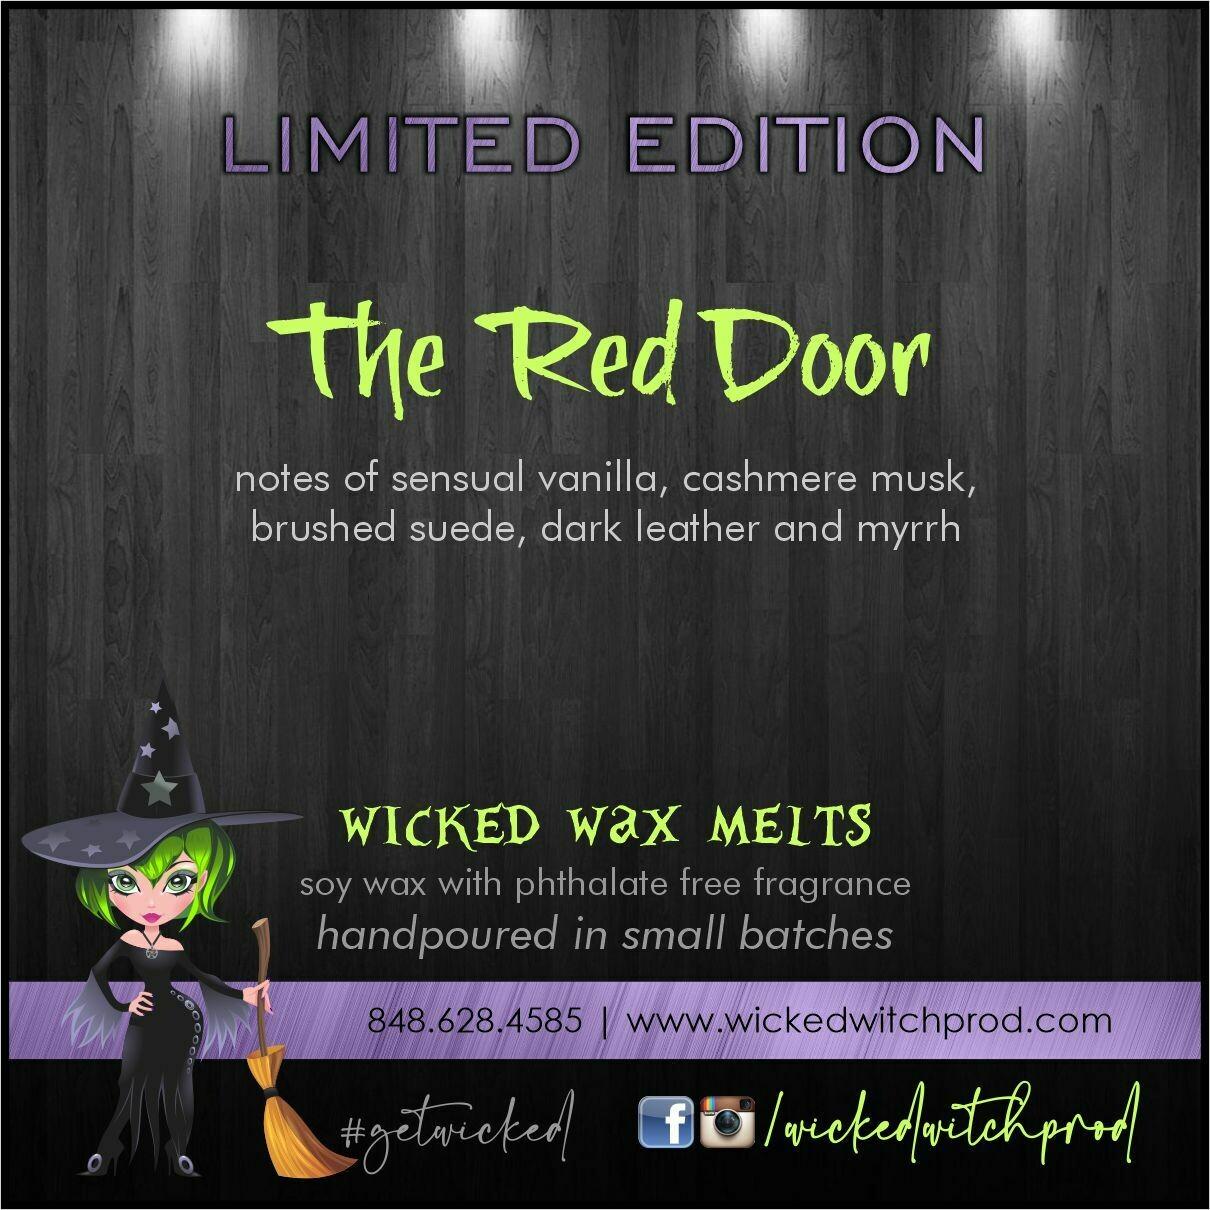 The Red Door Wicked Wax Melts